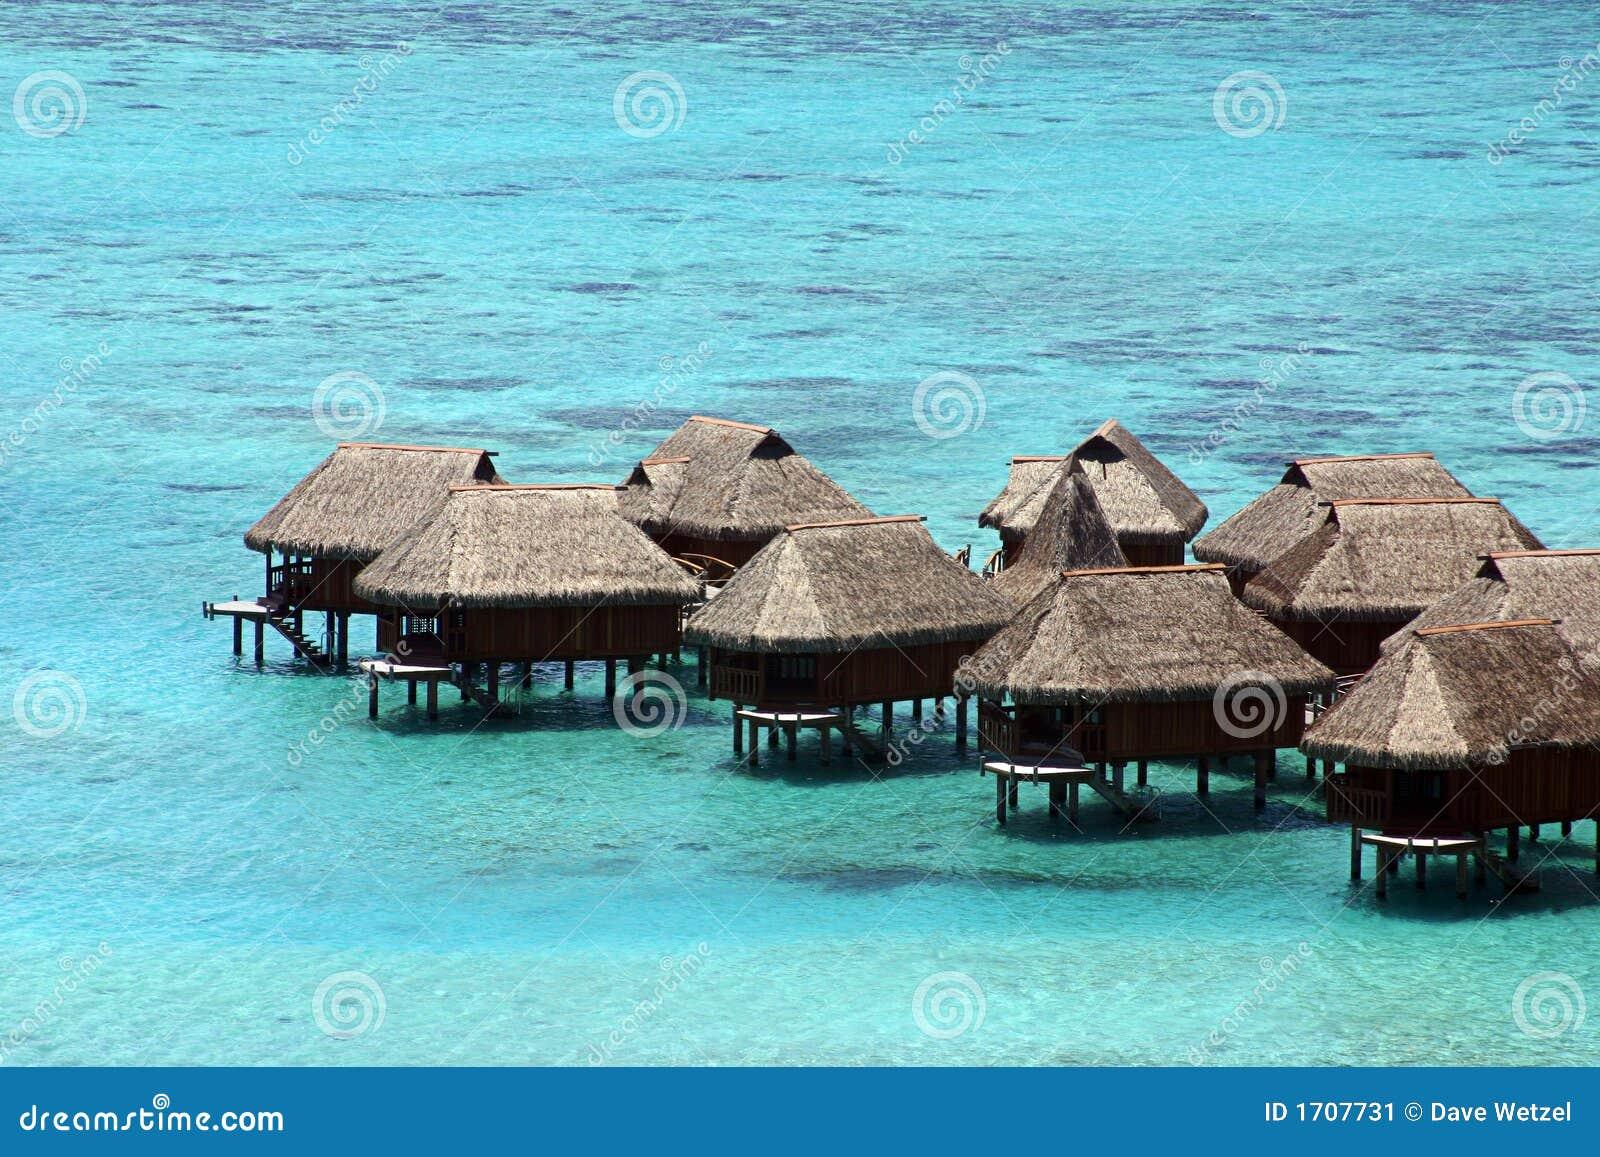 Huts in Tahiti